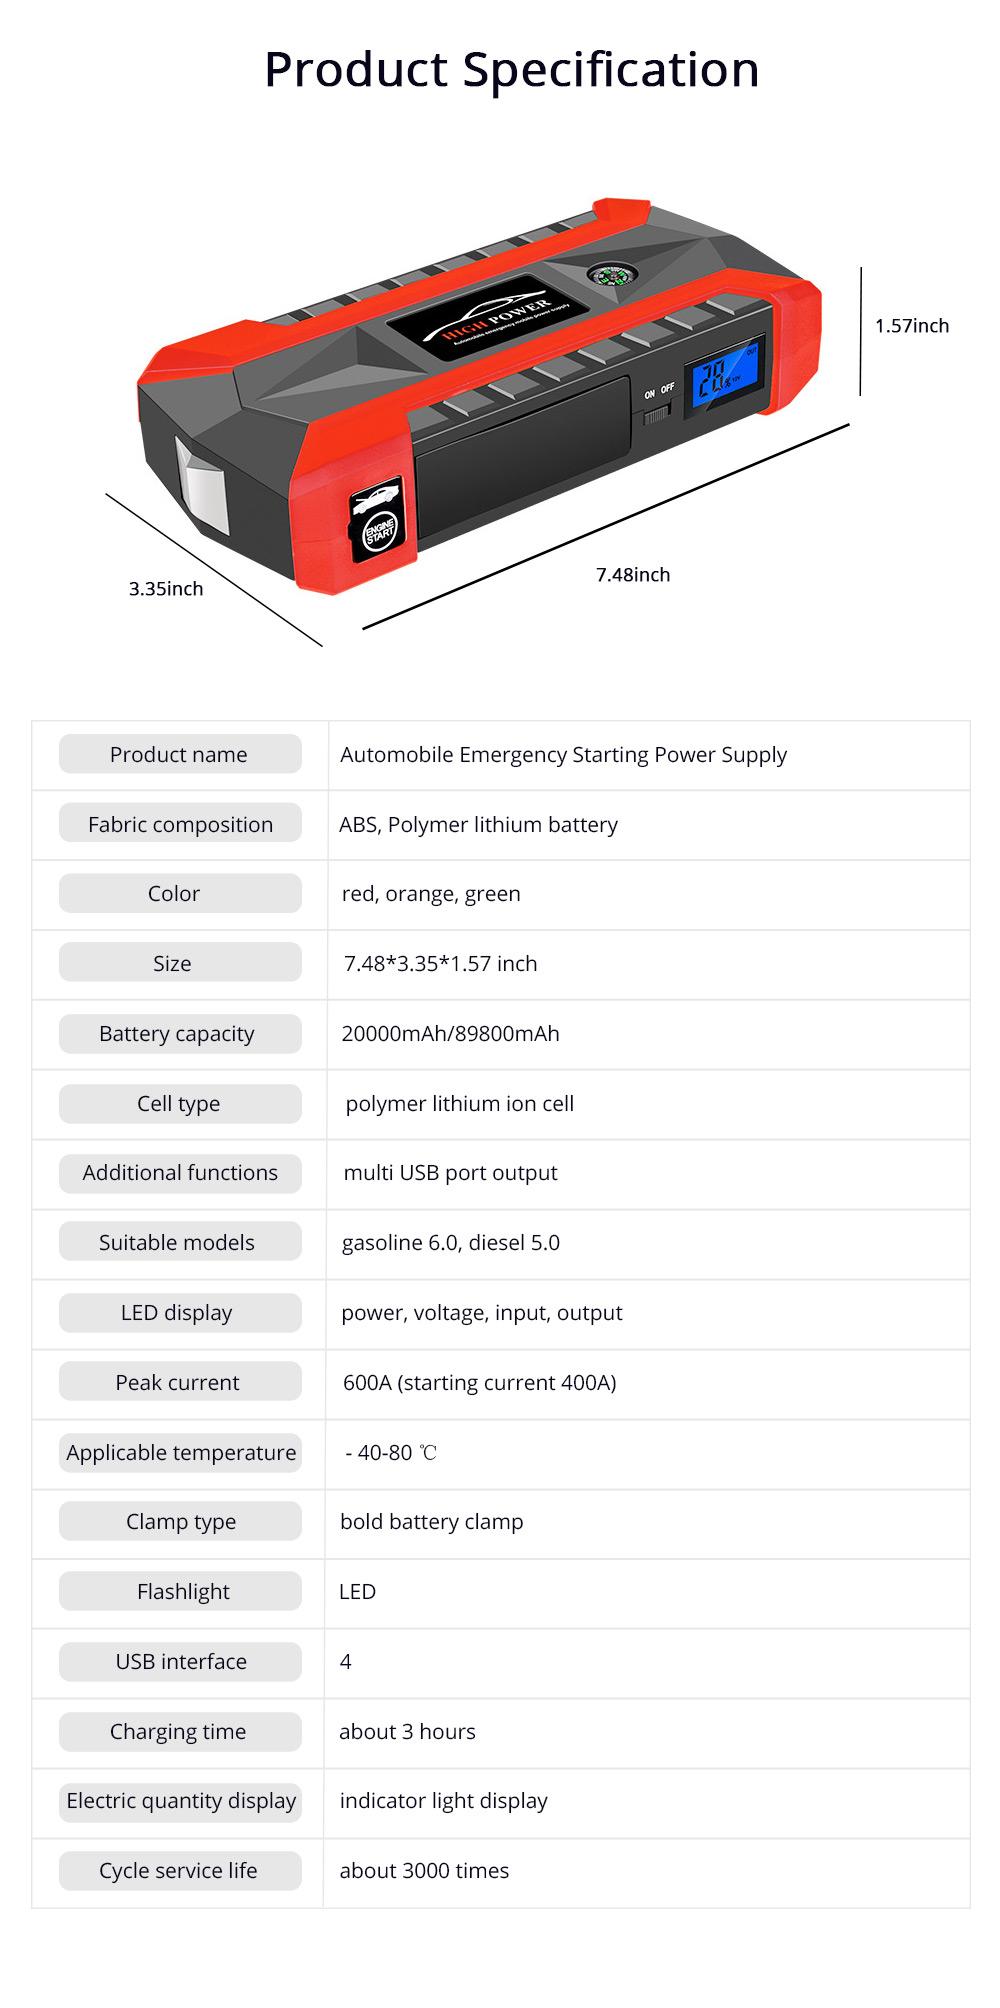 Automobile Emergency Starting Power Supply Automobile Diesel Gasoline Dual Start Standby Power Supply 9